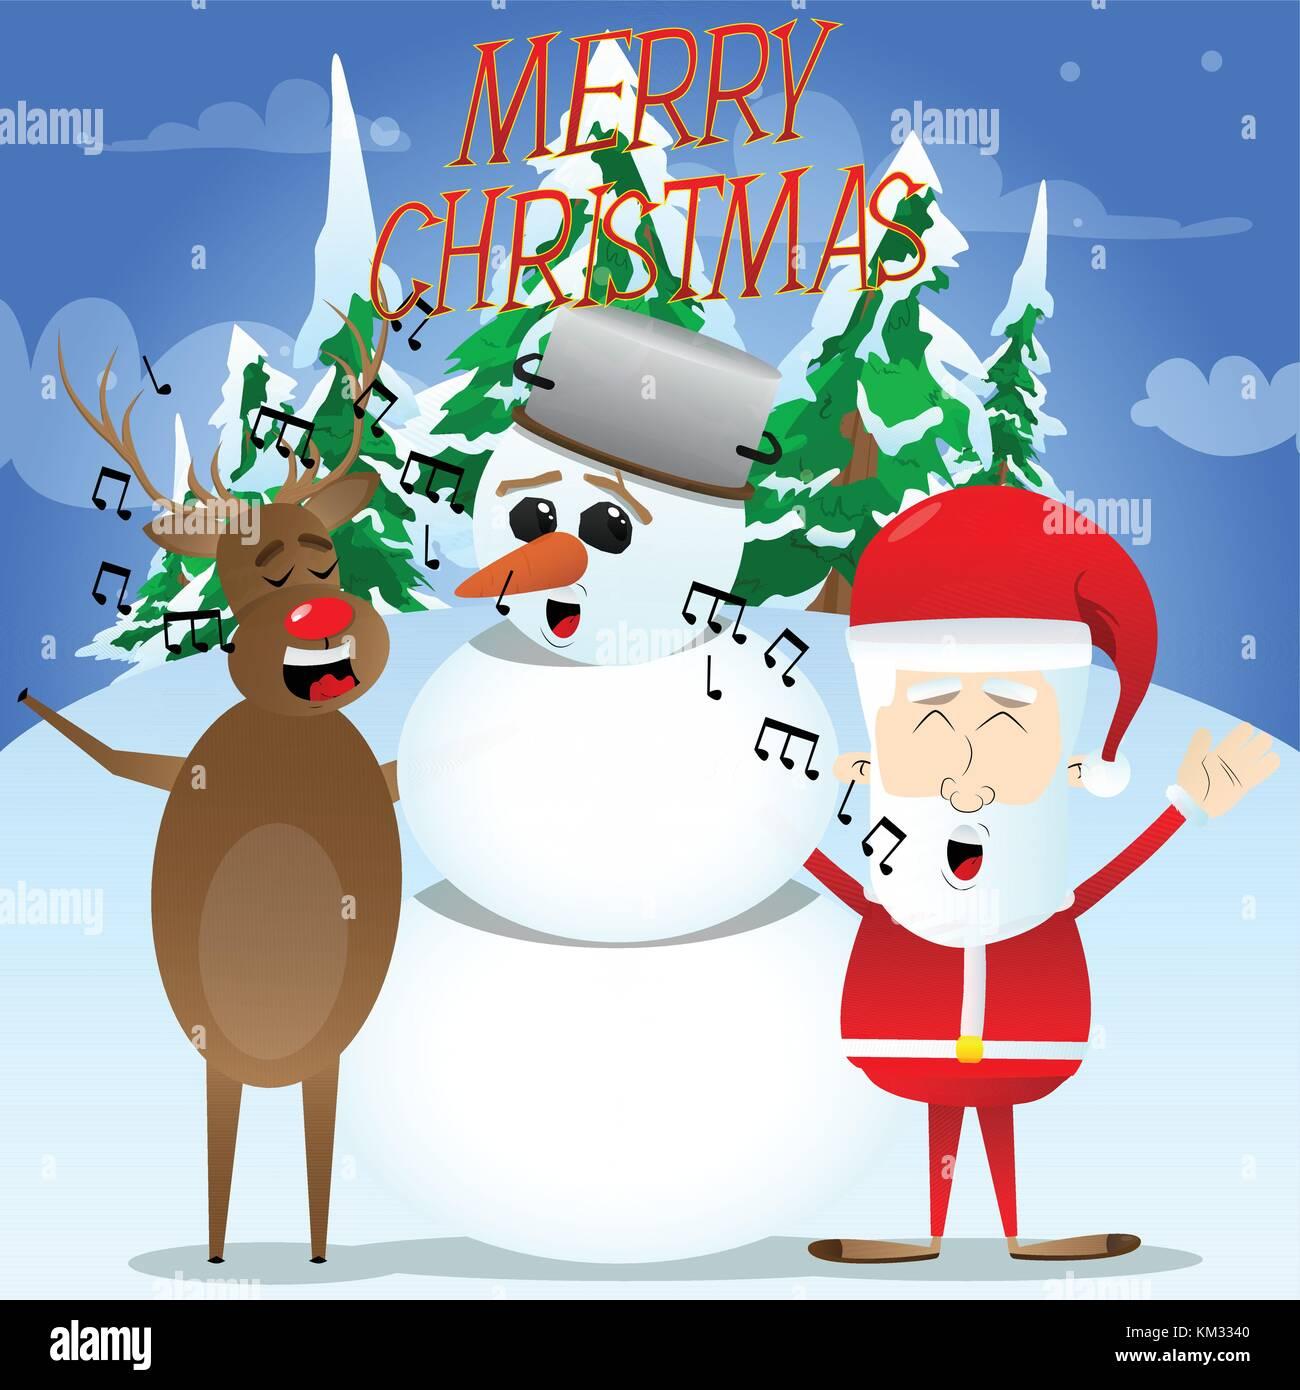 Christmas Caroling Images.Christmas Caroling Illustration Stock Photos Christmas Caroling